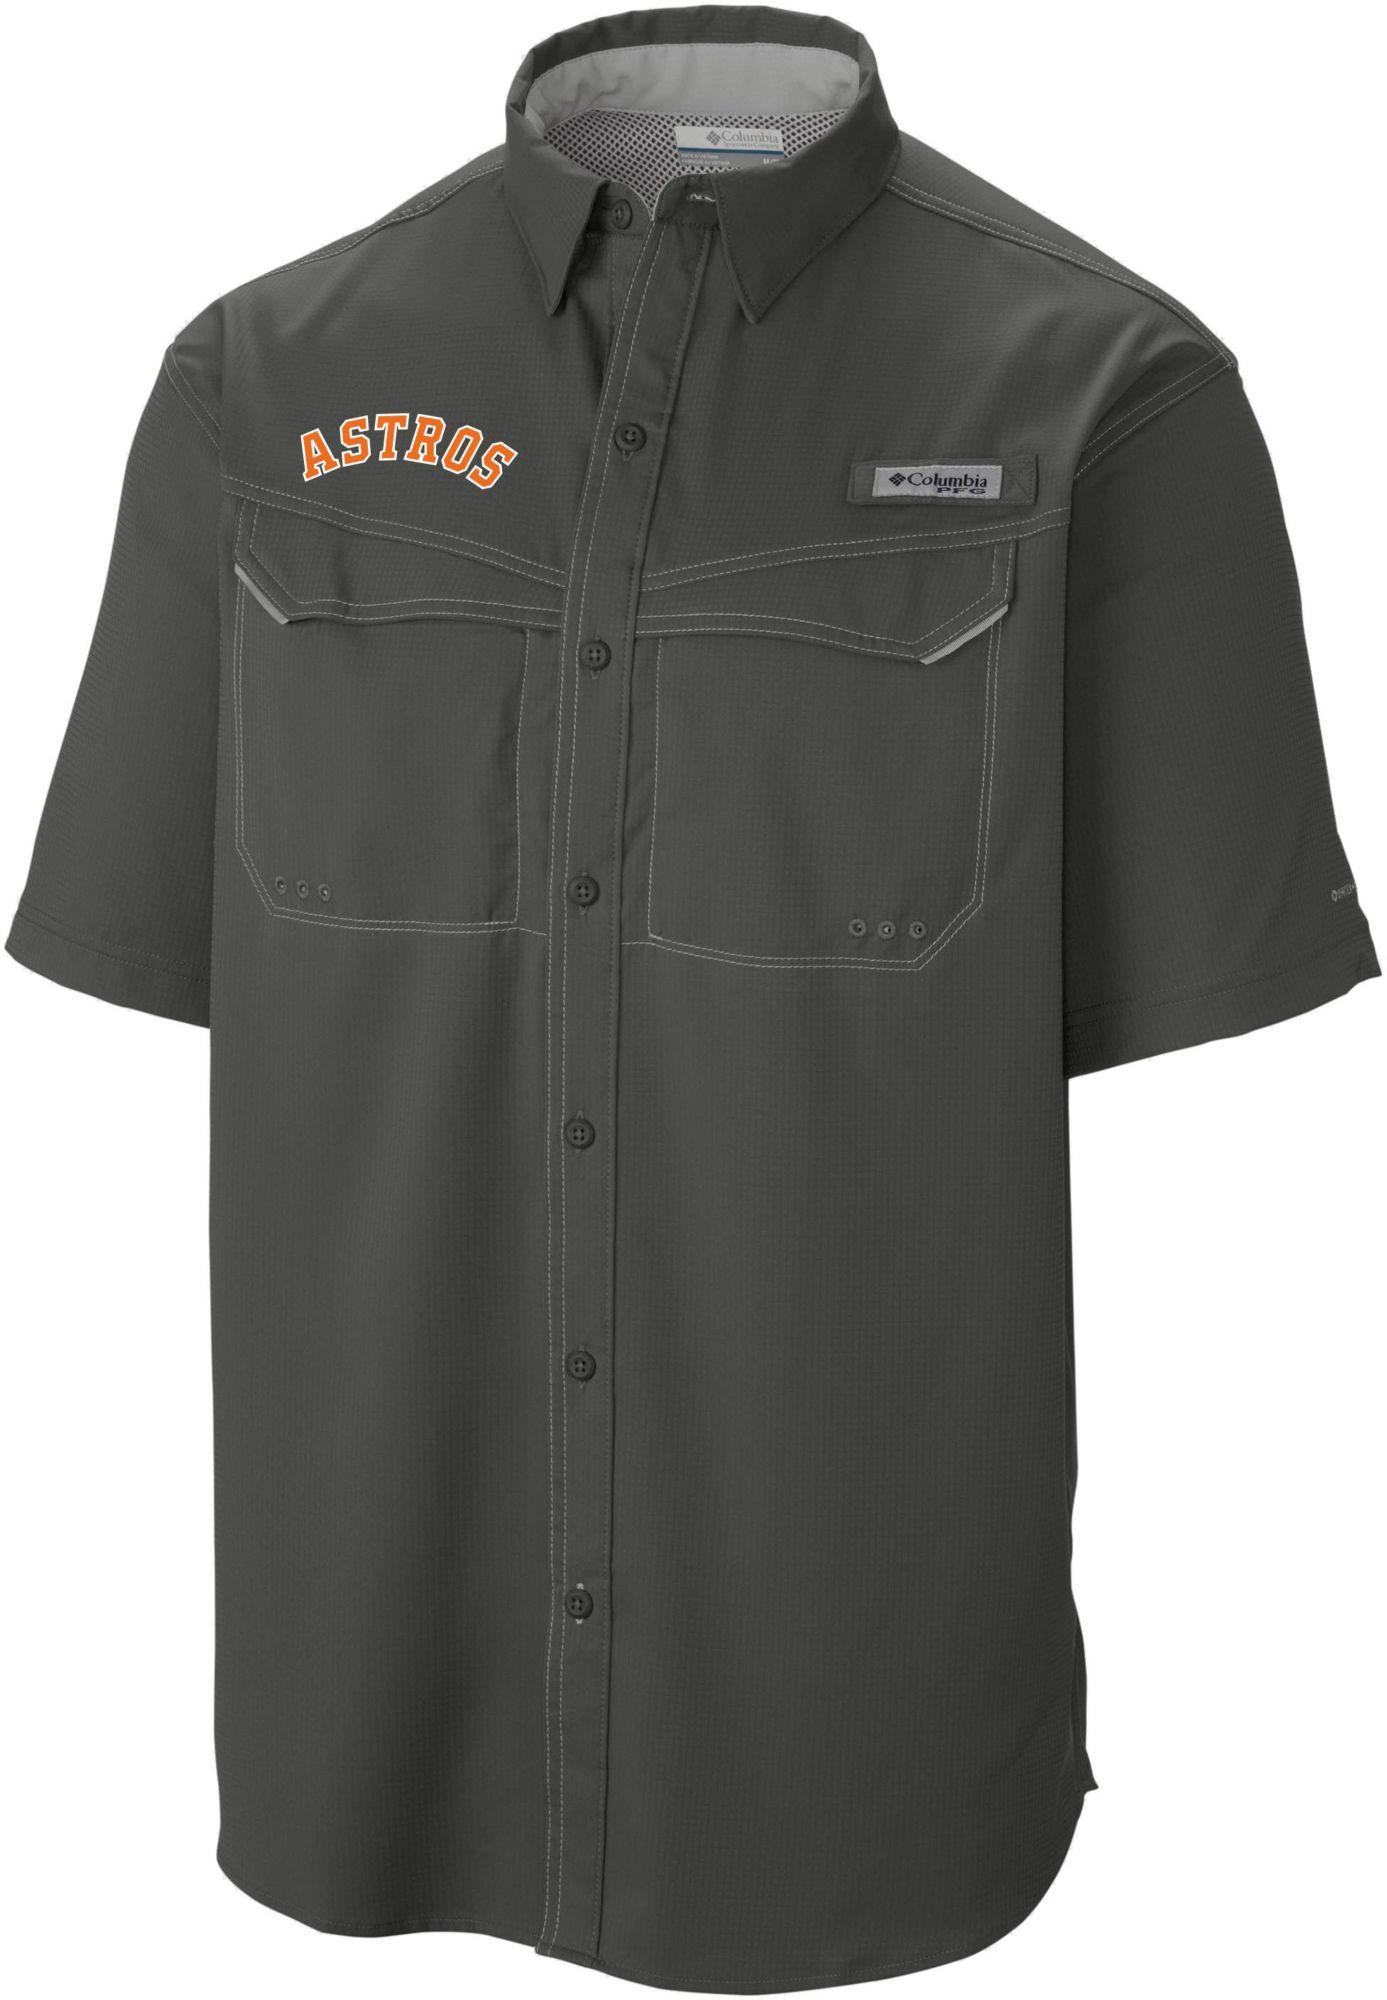 magellan angler shirt - HD1387×2000